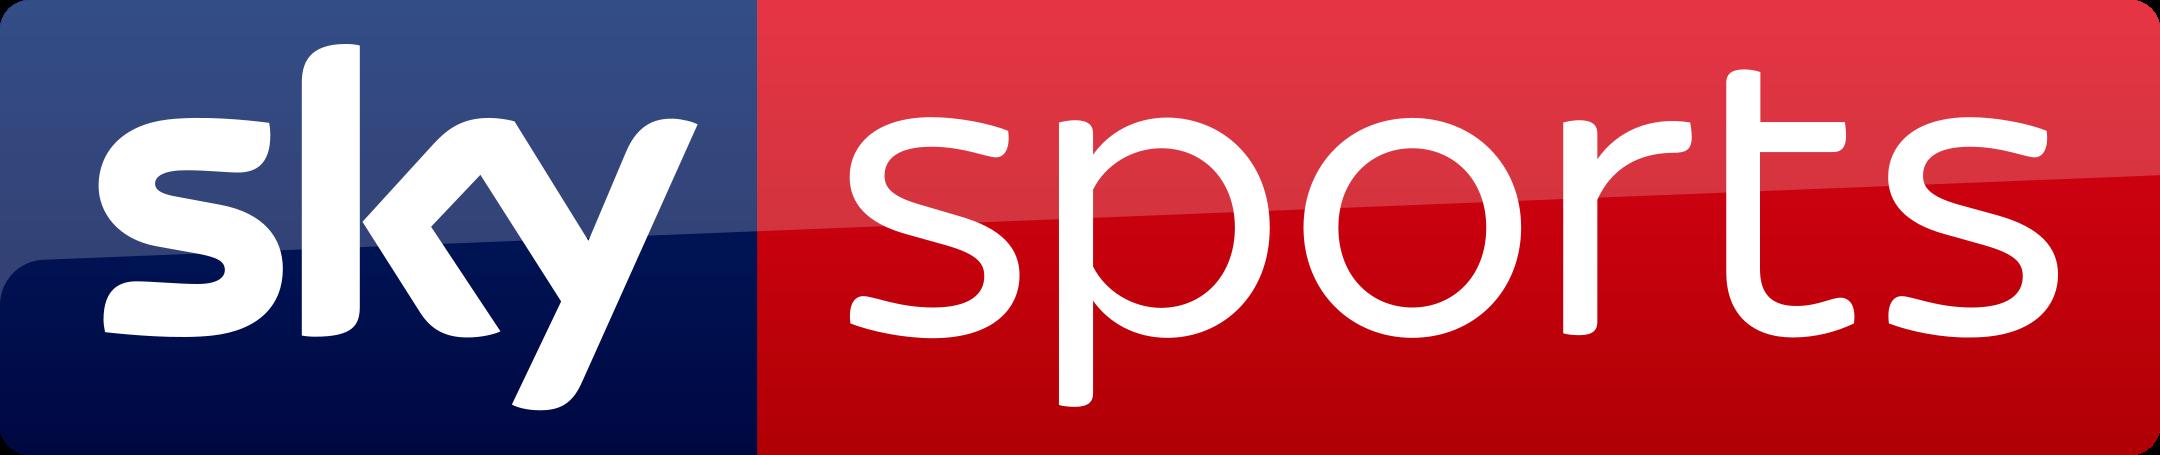 sky sports logo 1 - Sky Sports Logo